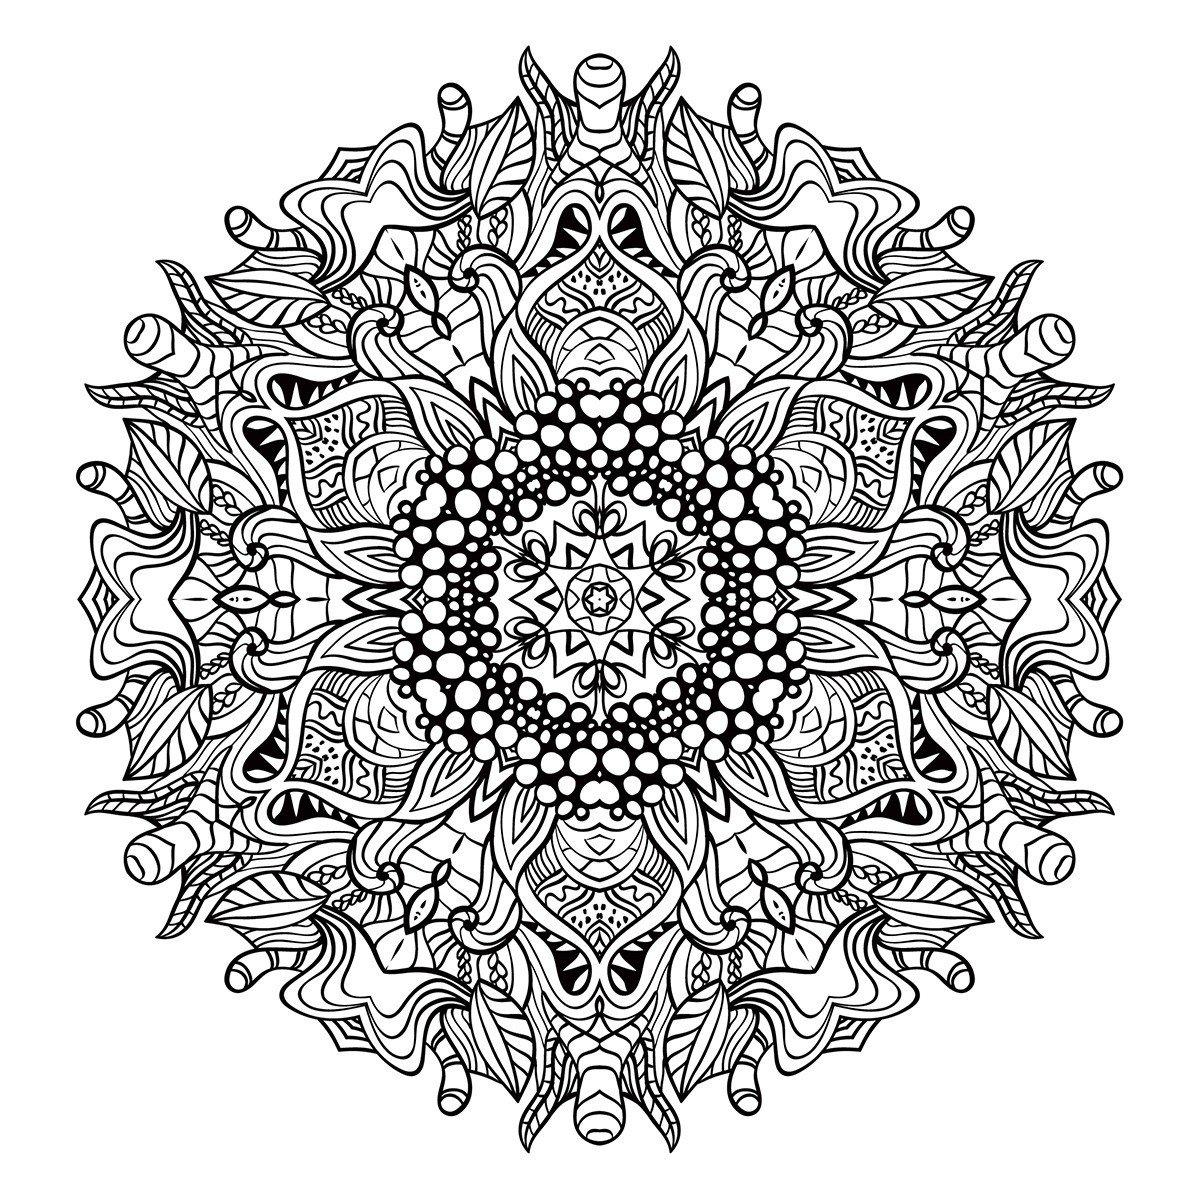 Картинка для раскраски «Мандала Поздняя осень»